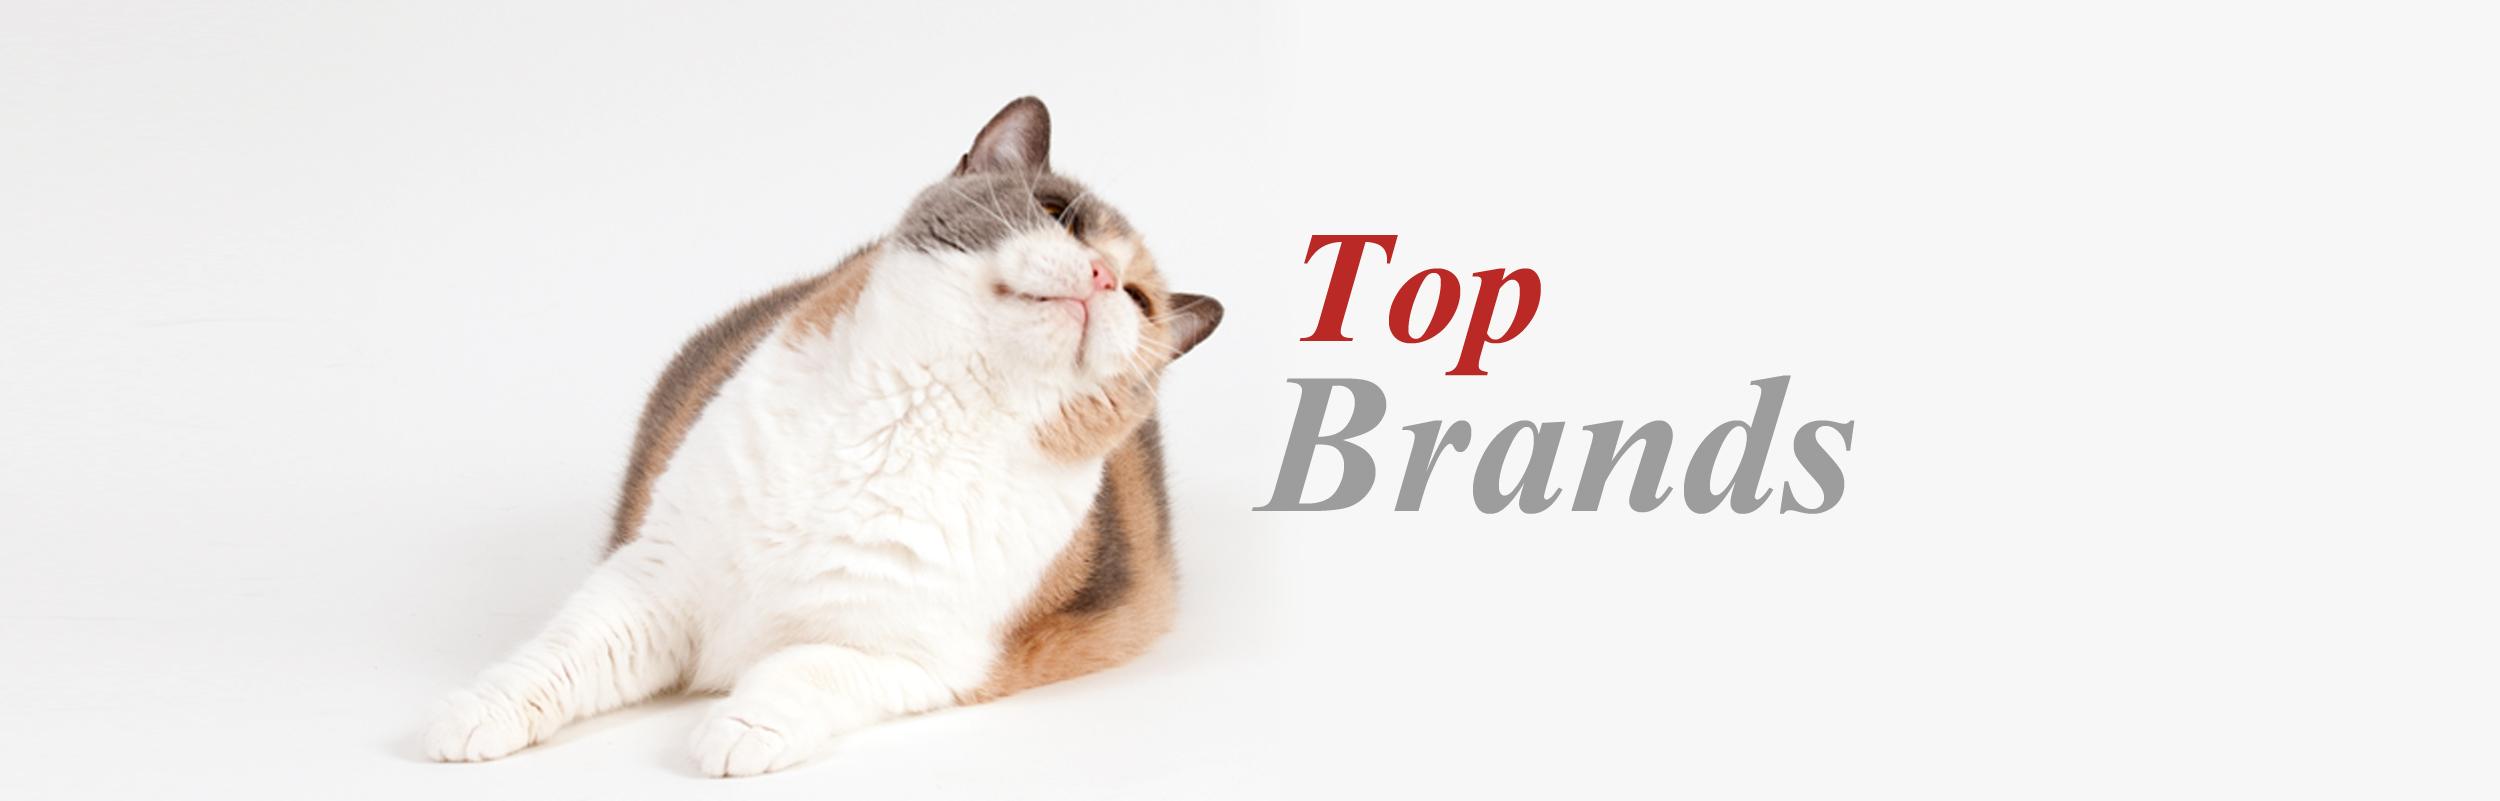 Top brands profeline cat supplies for Jackson galaxy da bird